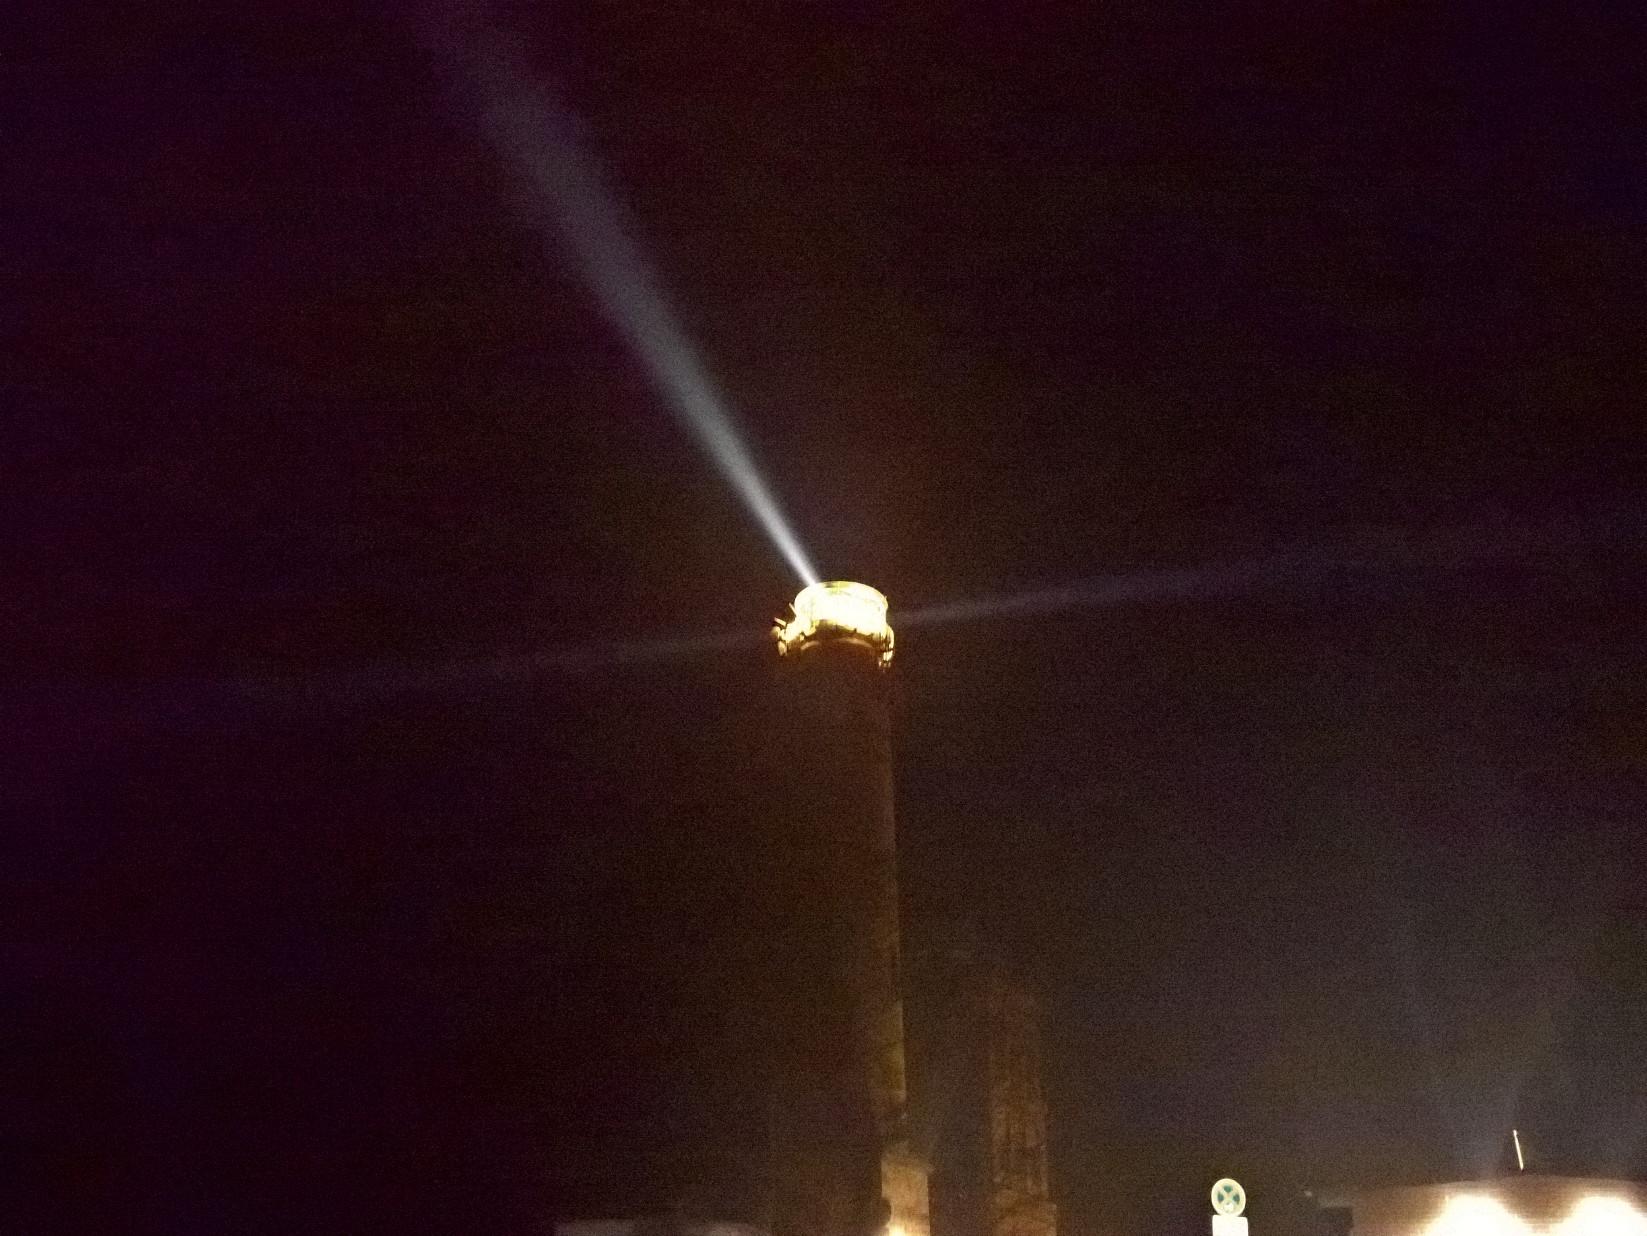 Leuchtturm am Kap Arkona bei Nacht auf Rügen